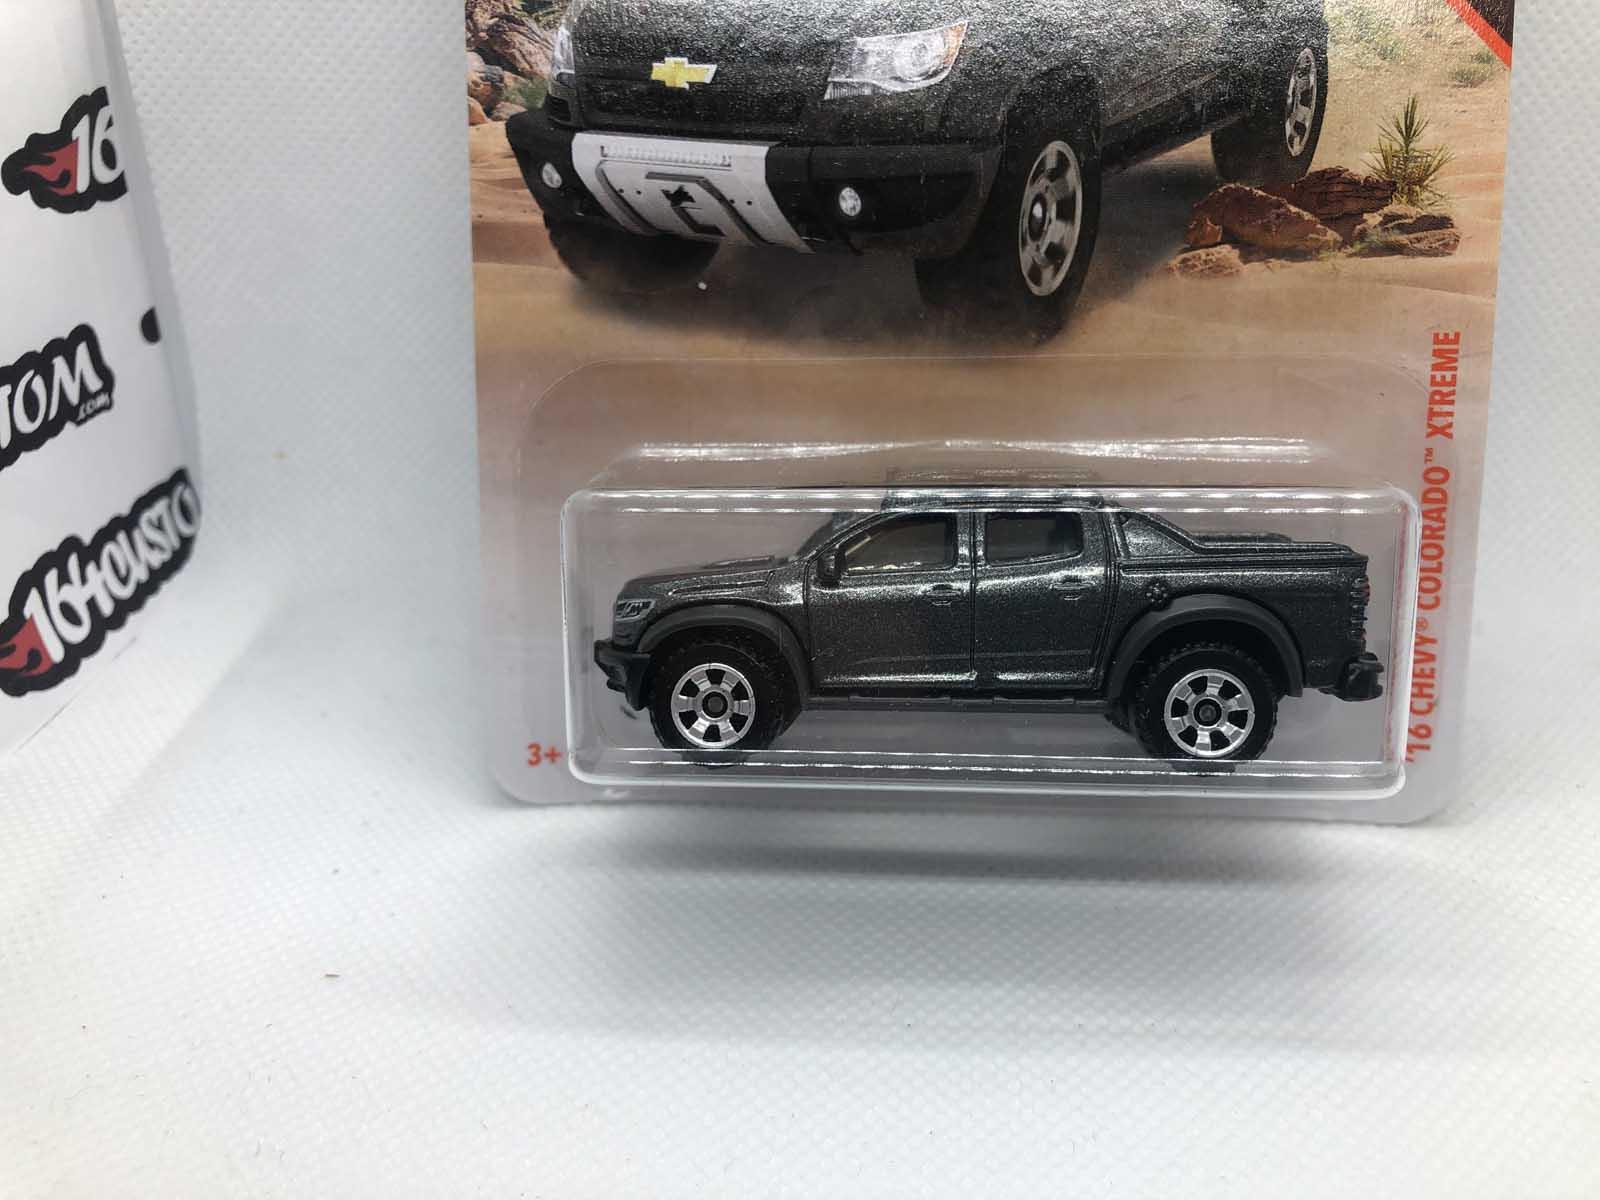 16 Chevy Colorado Xtreme